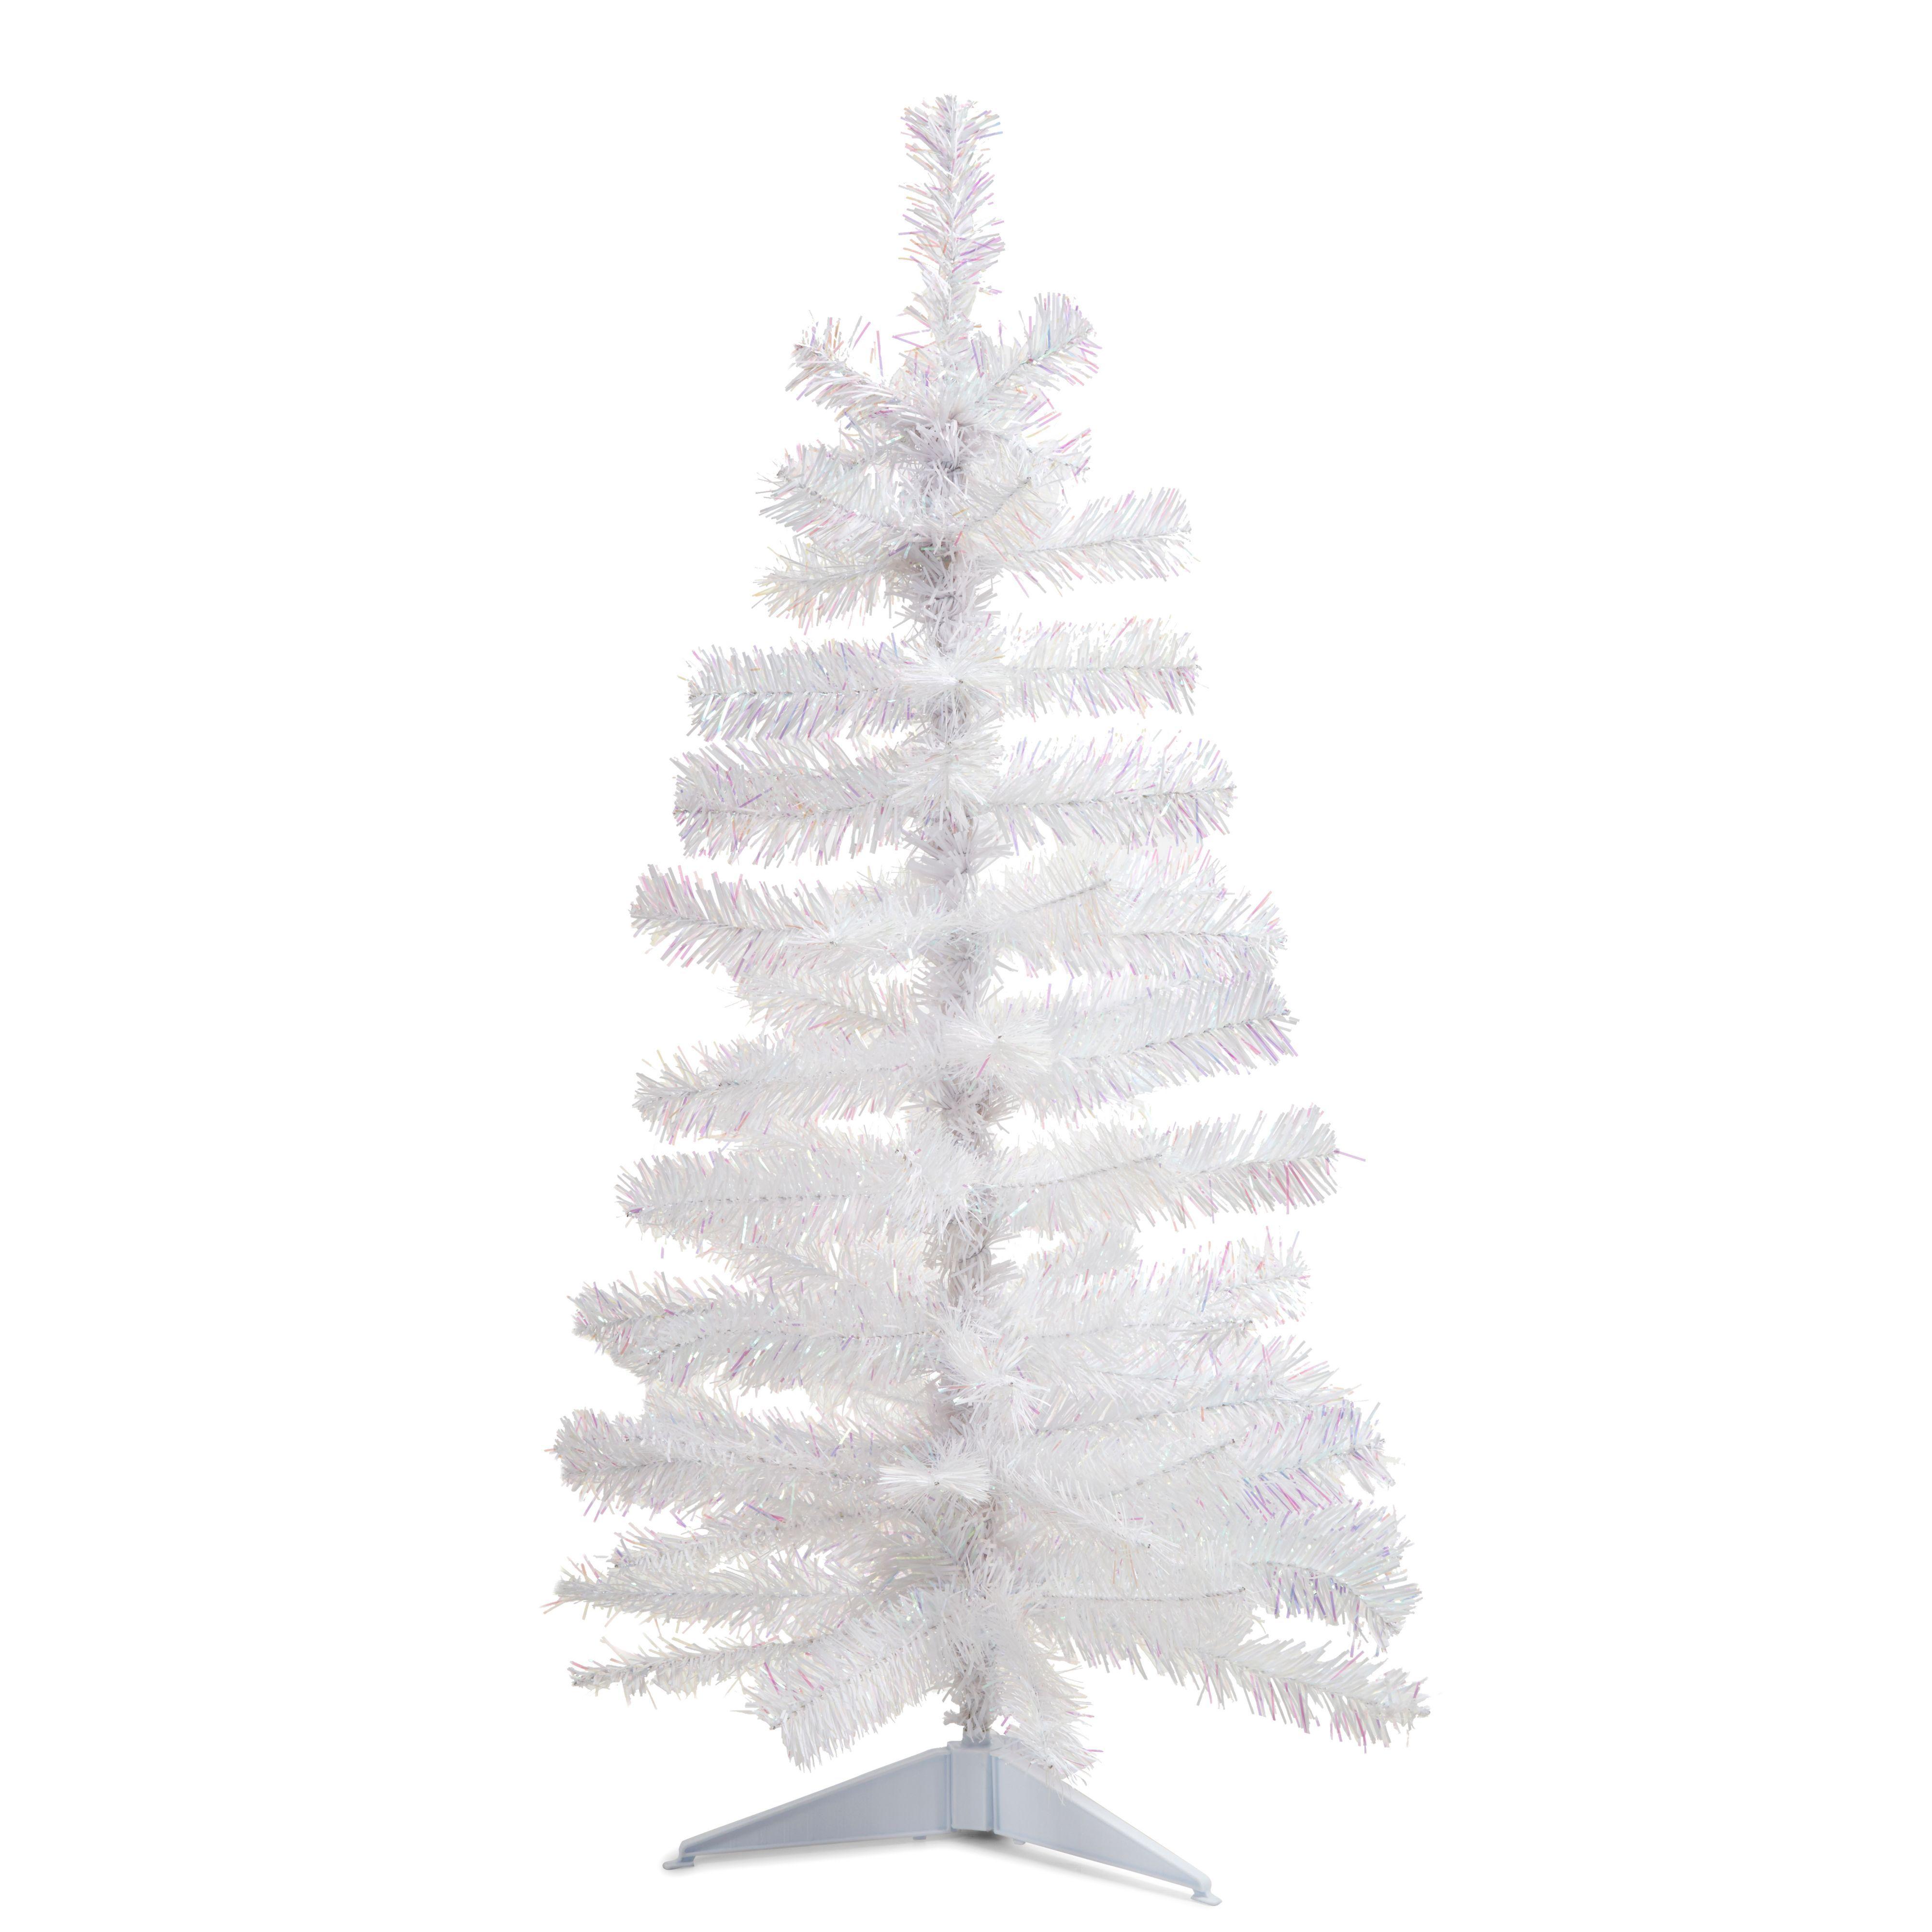 3ft White Christmas Tree.3ft White White Christmas Tree Departments Diy At B Q